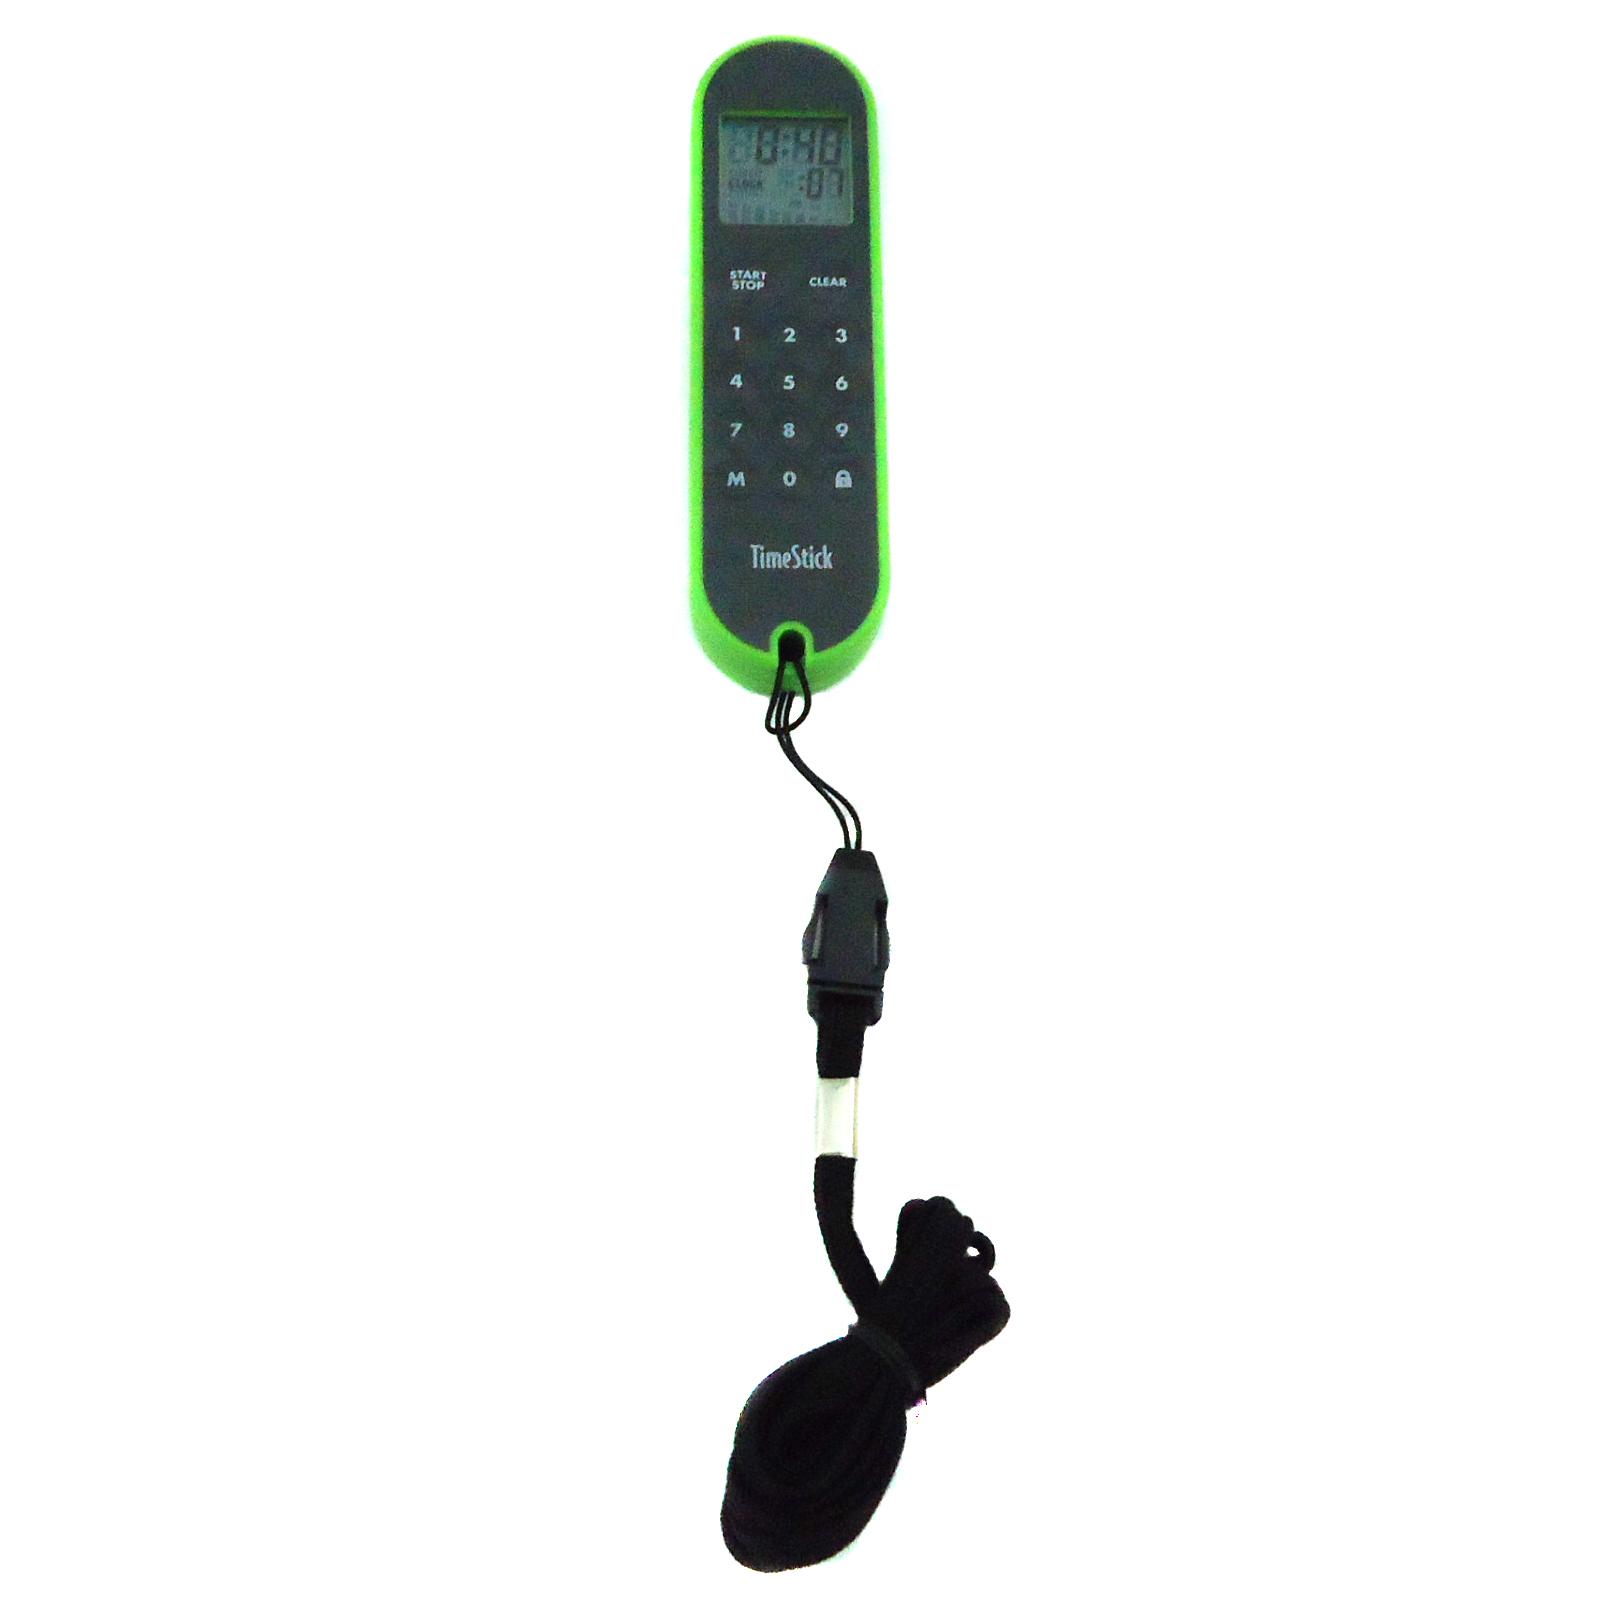 Eti 806-183 TimeStick Αδιάβροχο Χρονόμετρο - Χρώμα: Πράσινο επαγγελματικός εξοπλισμός   επαγγελματικά σκεύη είδη σερβιρίσματος   εργαλεία κο